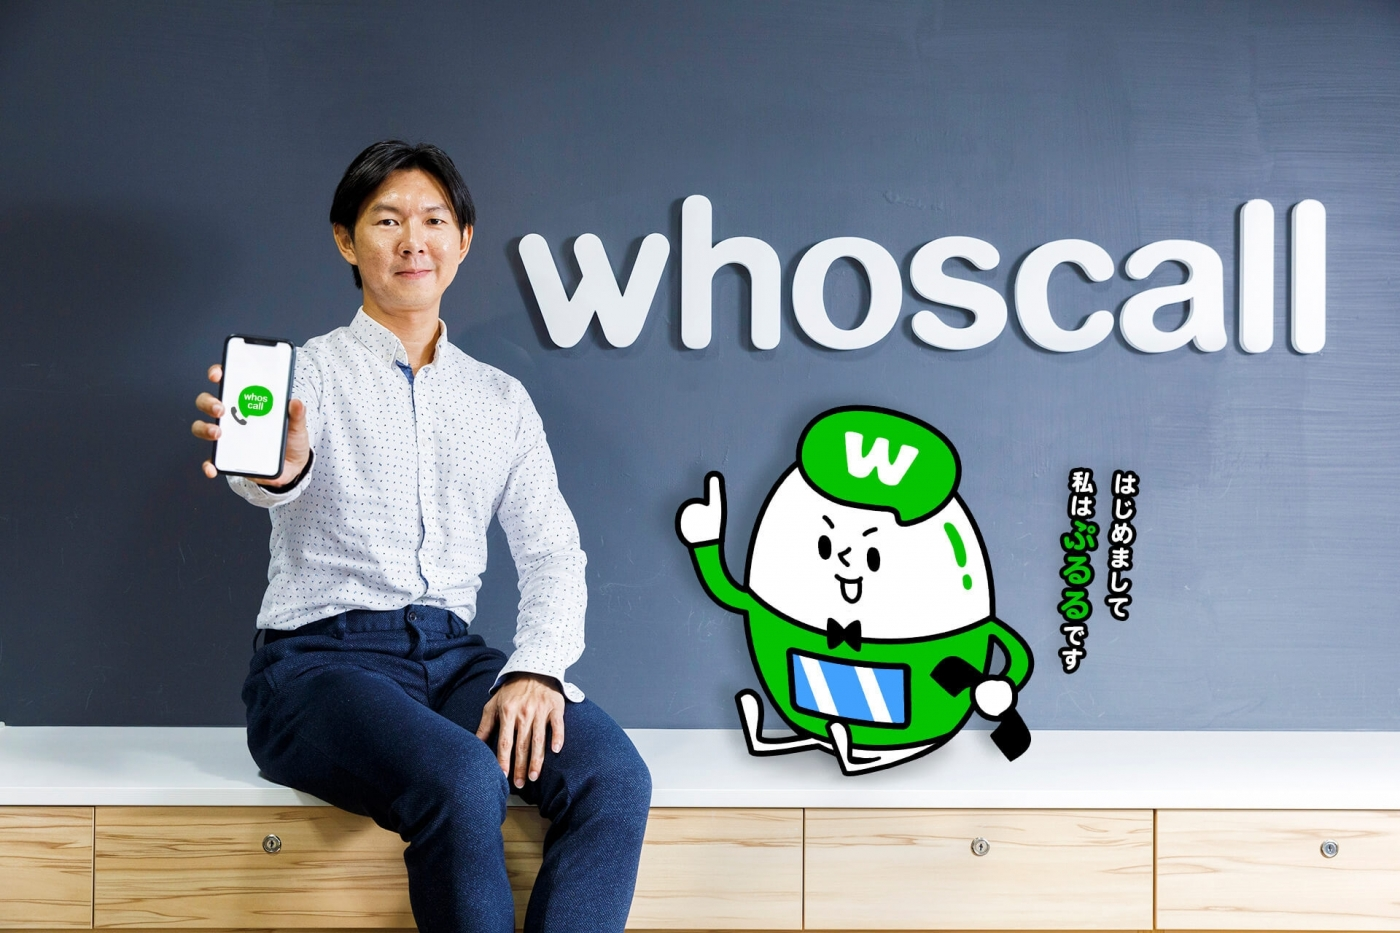 Whoscall母公司Gogolook插旗日本!獲新一輪投資後,創辦人如何實現「防詐夢」?